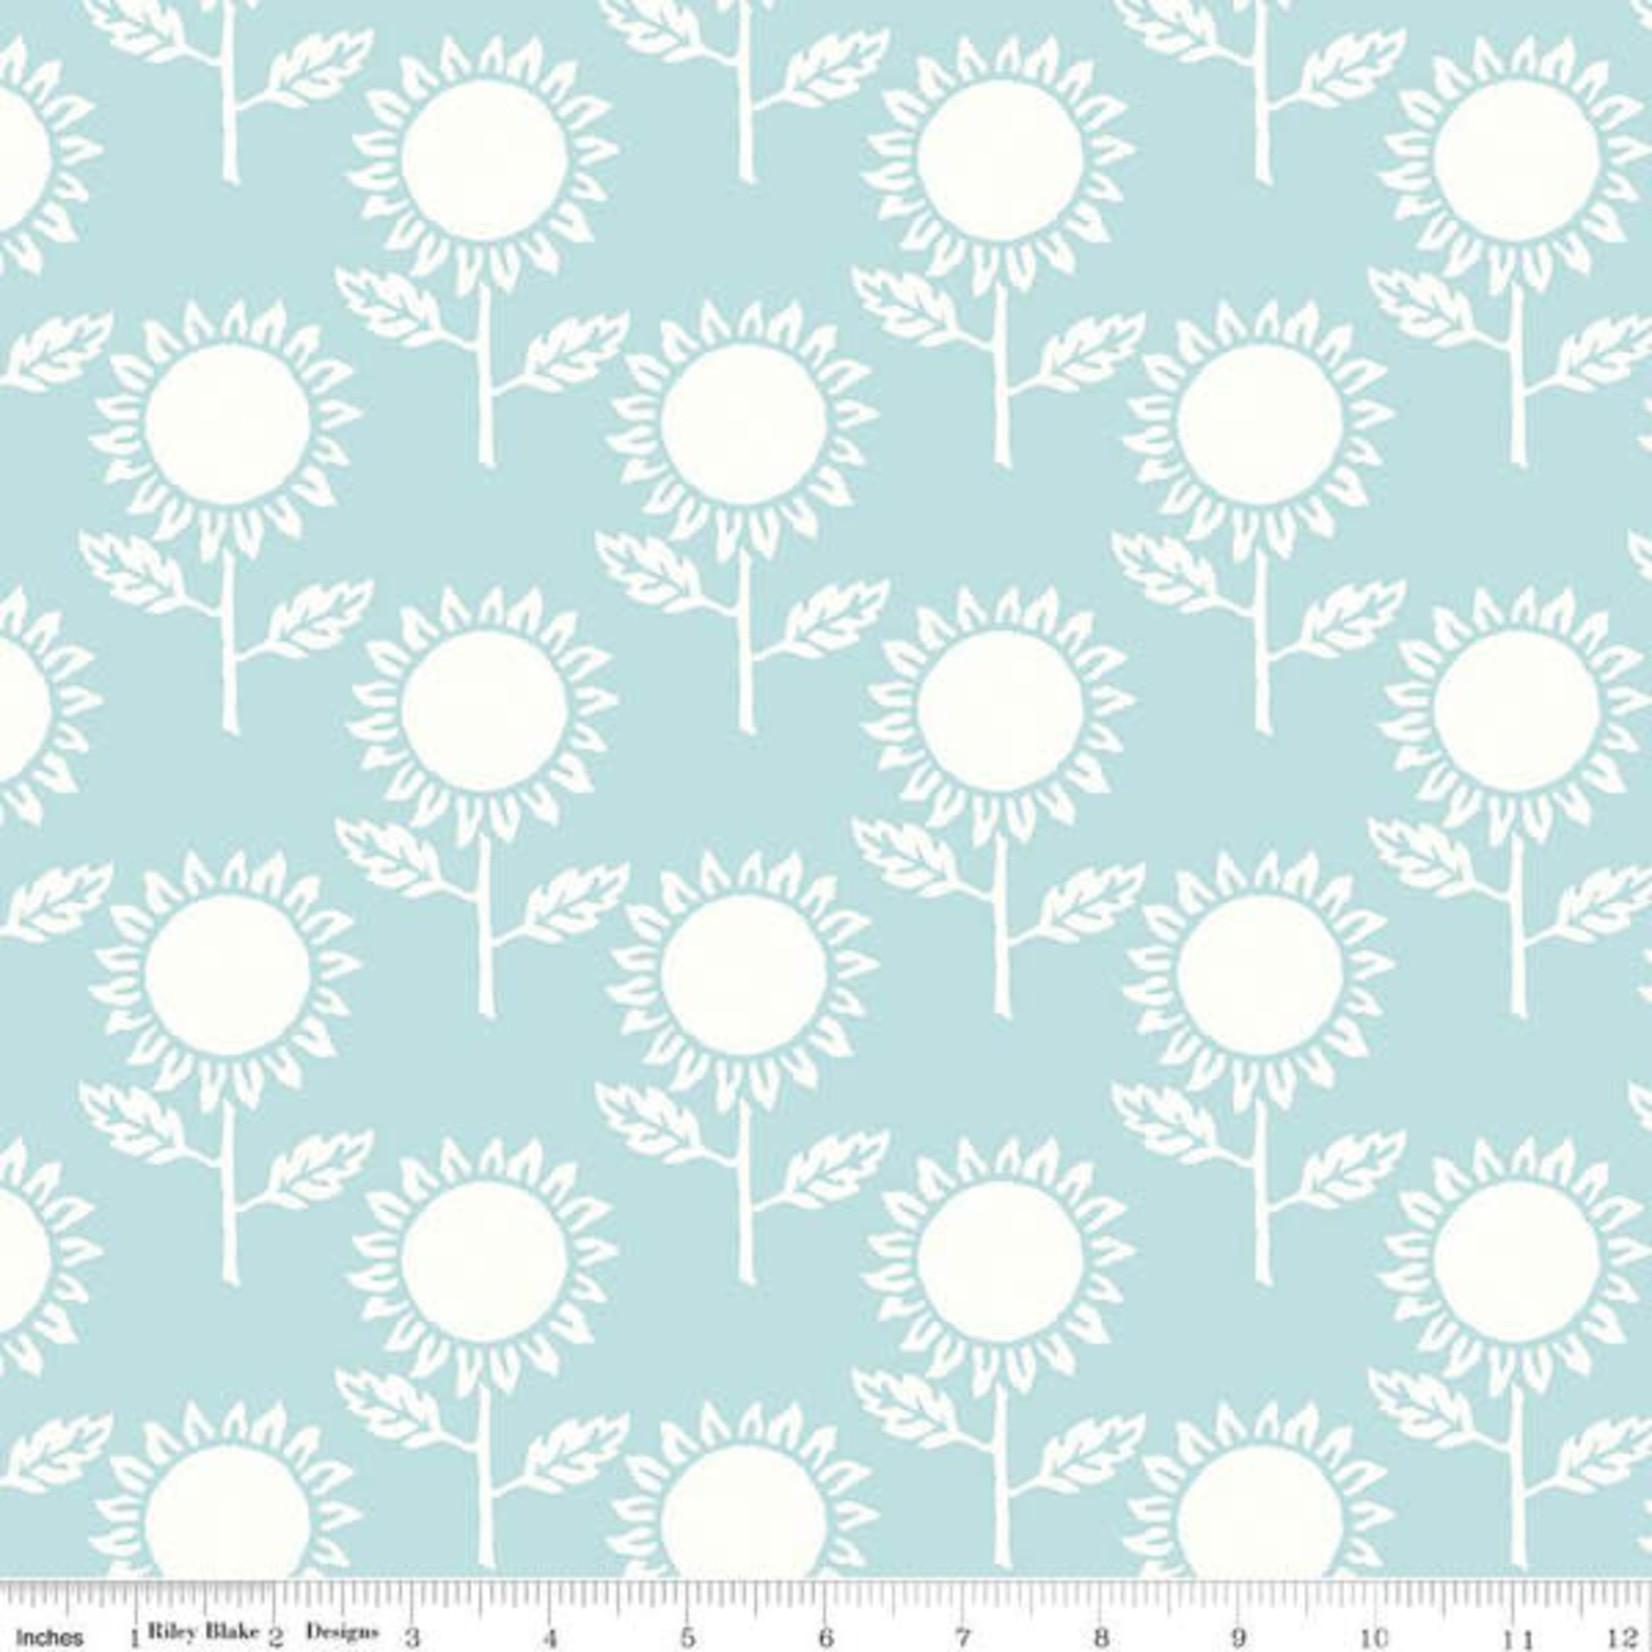 RILEY BLAKE DESIGNS Hungry Animal Alphabet, Sunflowers, Blue per cm or $20/m